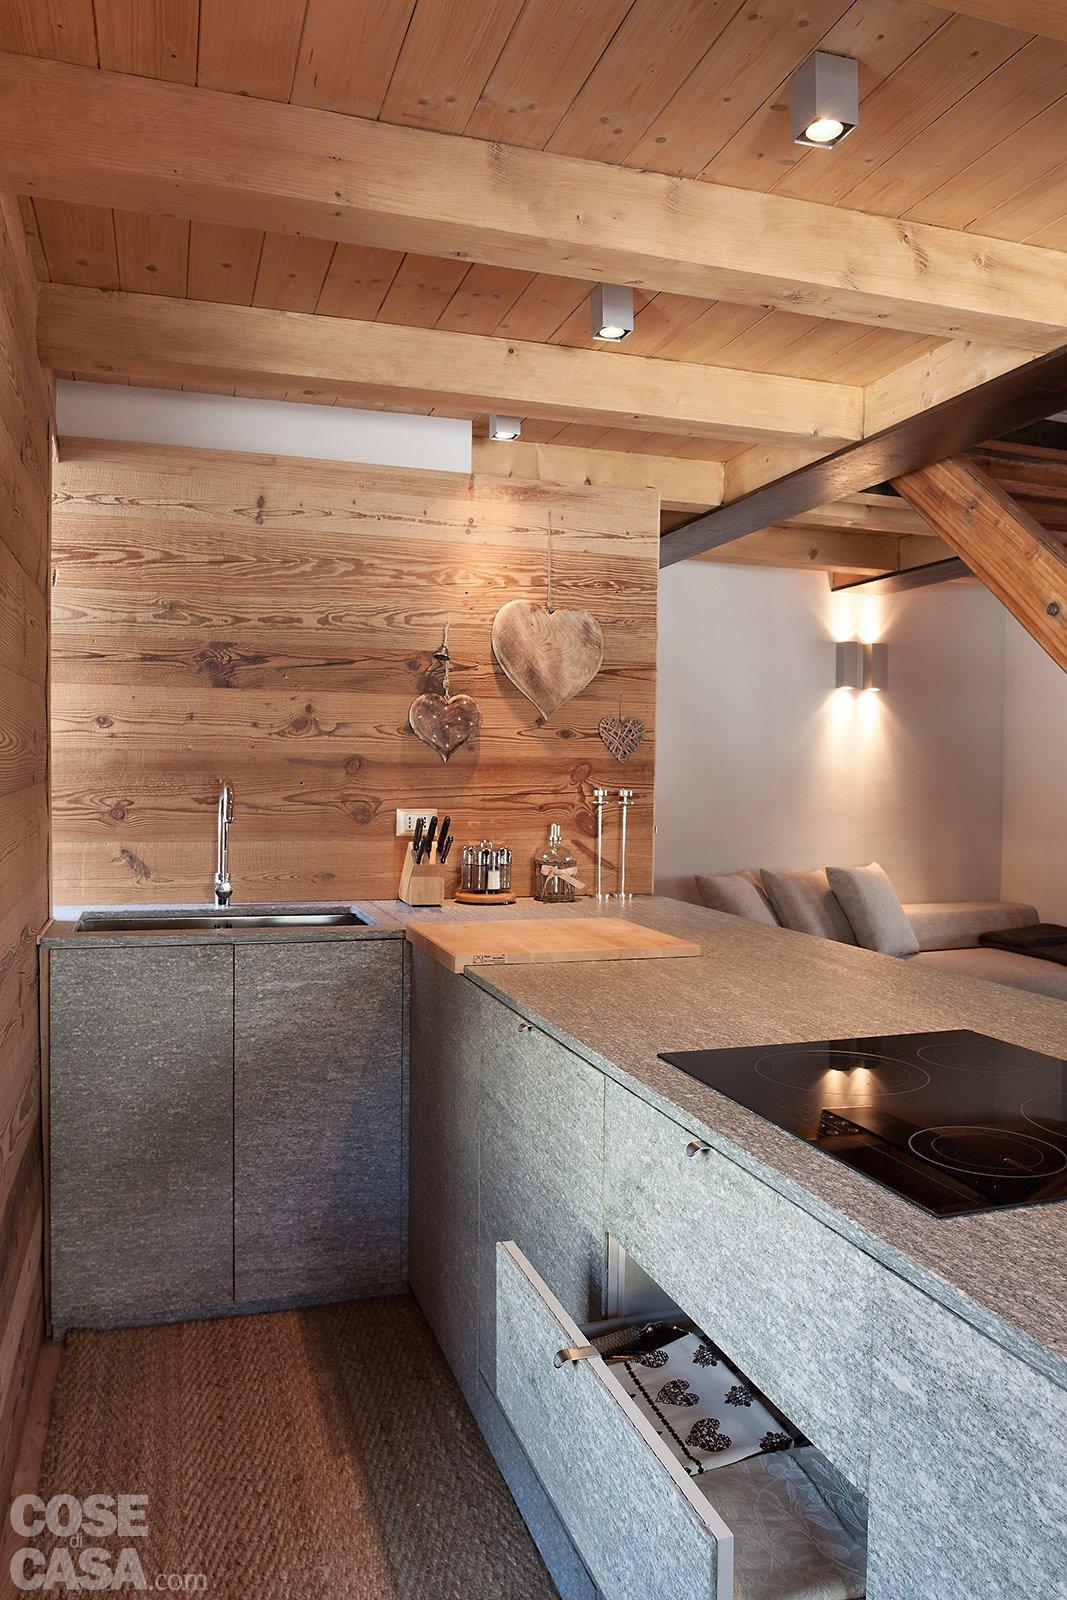 Cucine Stile Montagna - Idee Per La Casa - Syafir.com